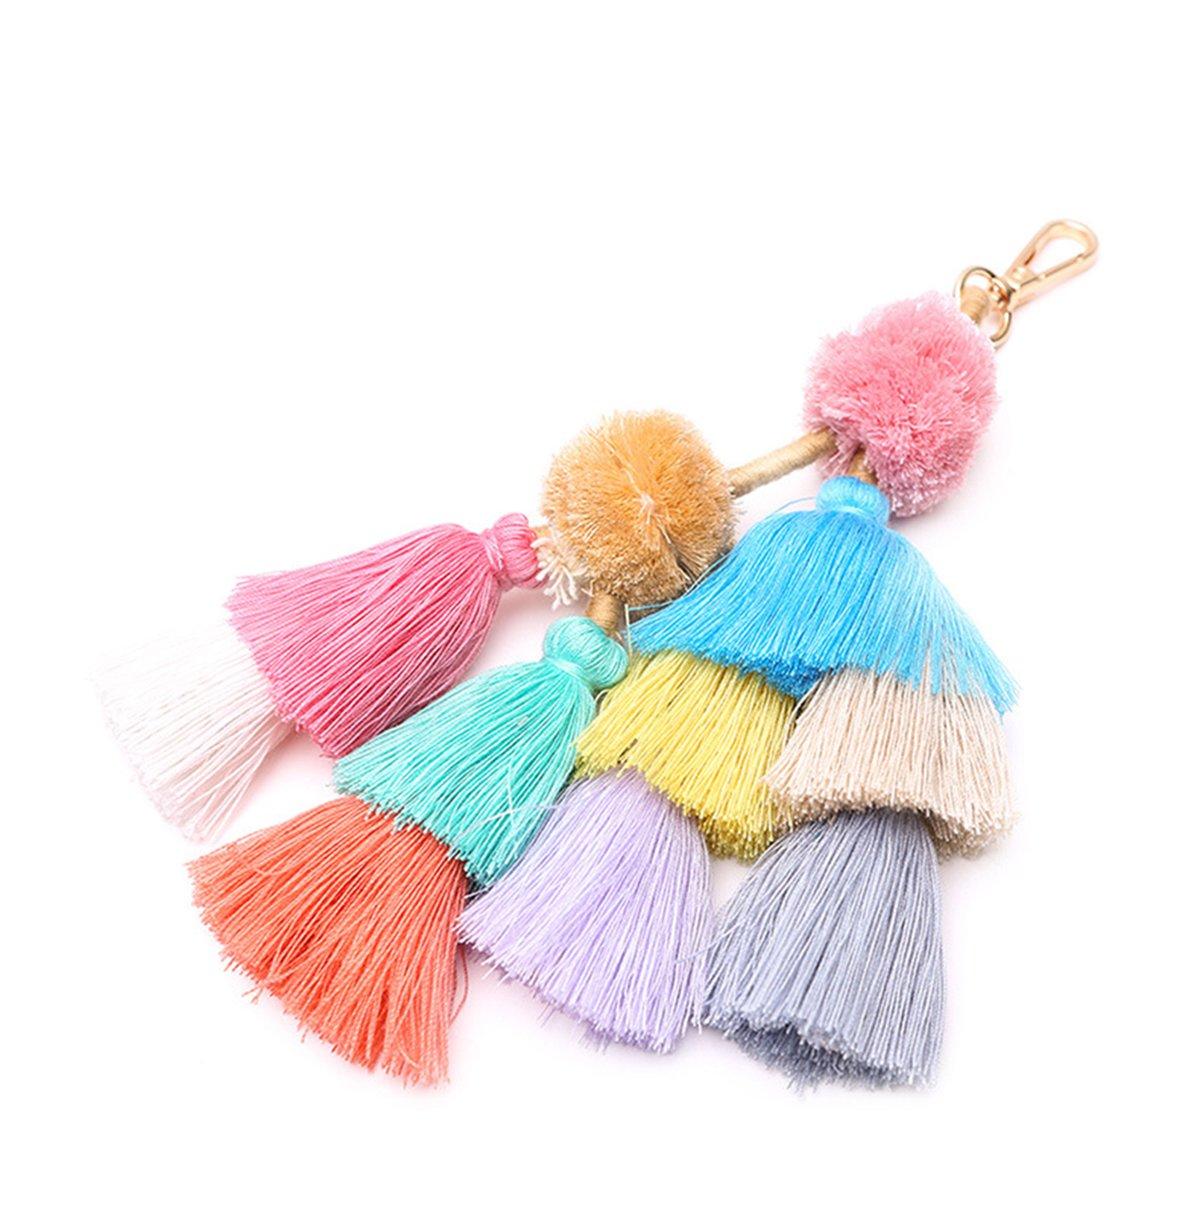 ZOONAI Women Colorful Tassel Charm Keychain Car Keyring Holder Handbag Bag Purse Pendant (C)